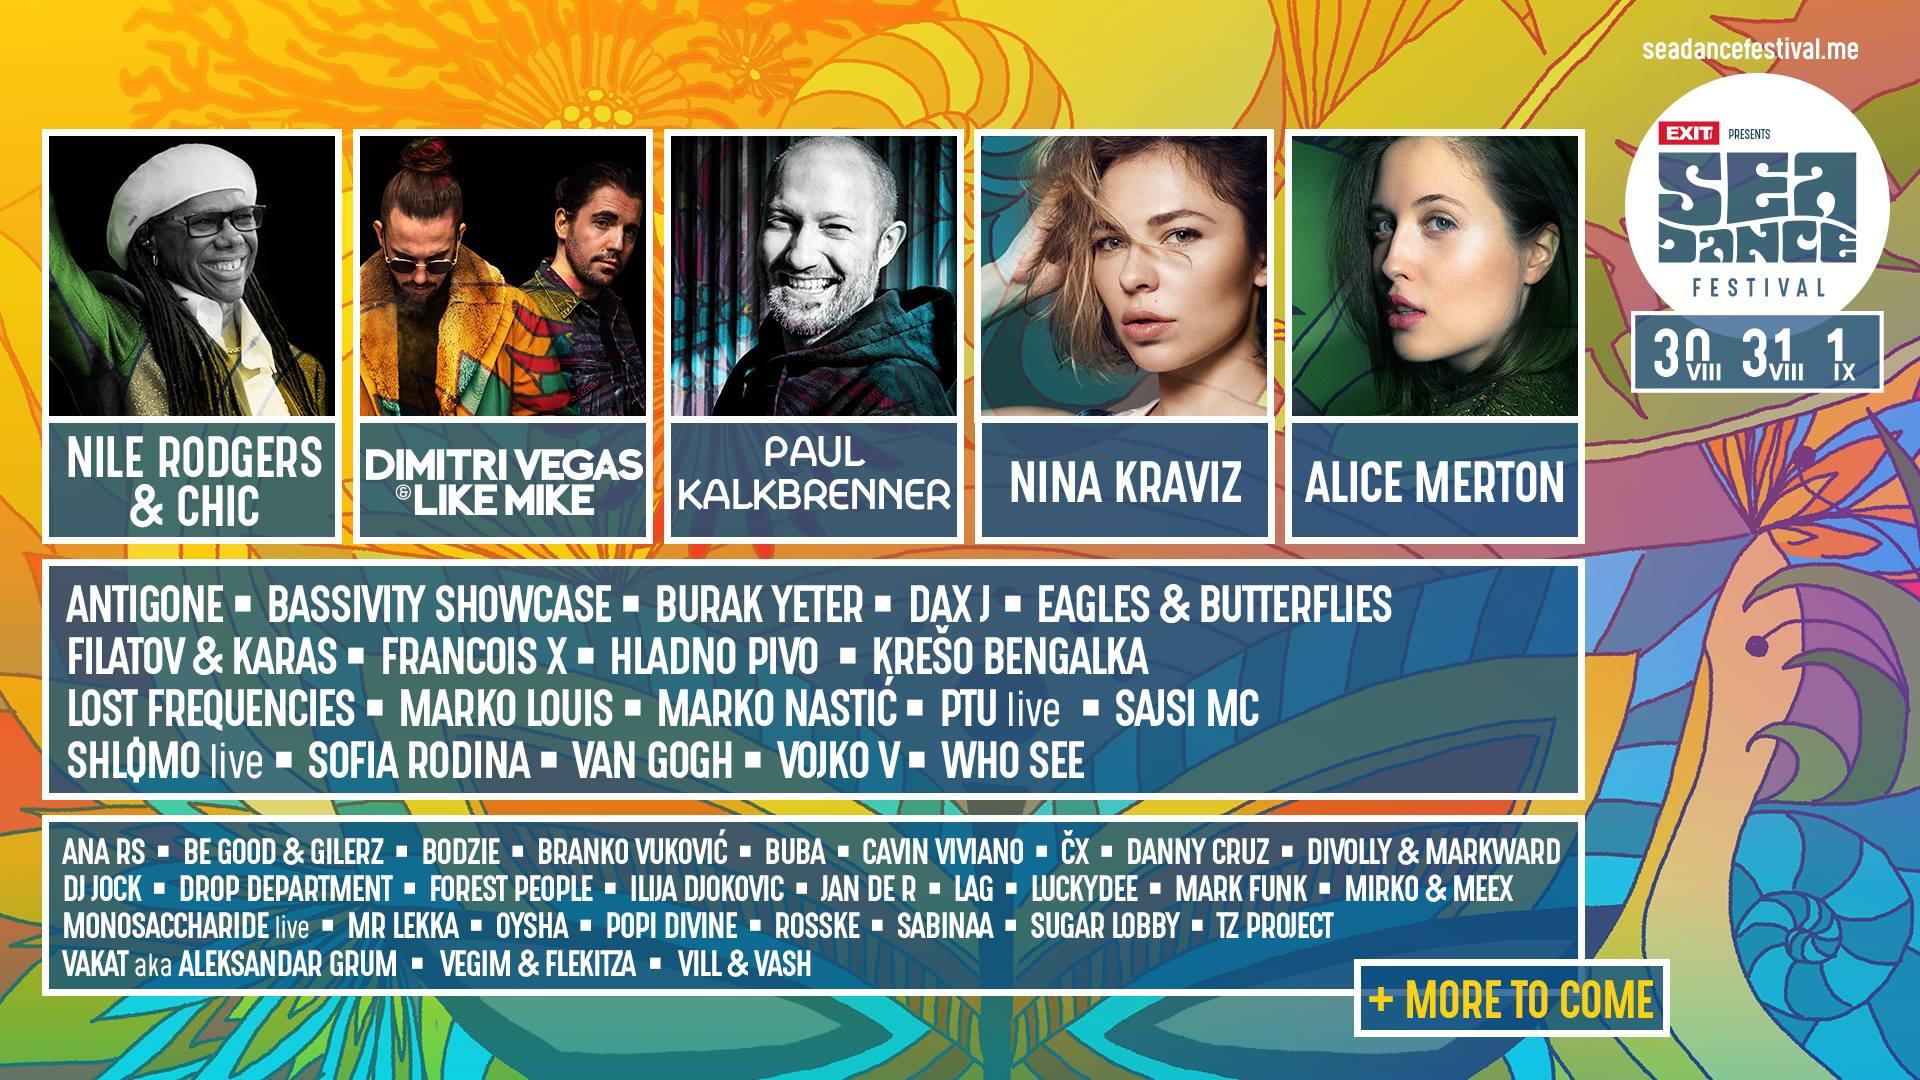 Sea Dance festival u Crnoj Gori